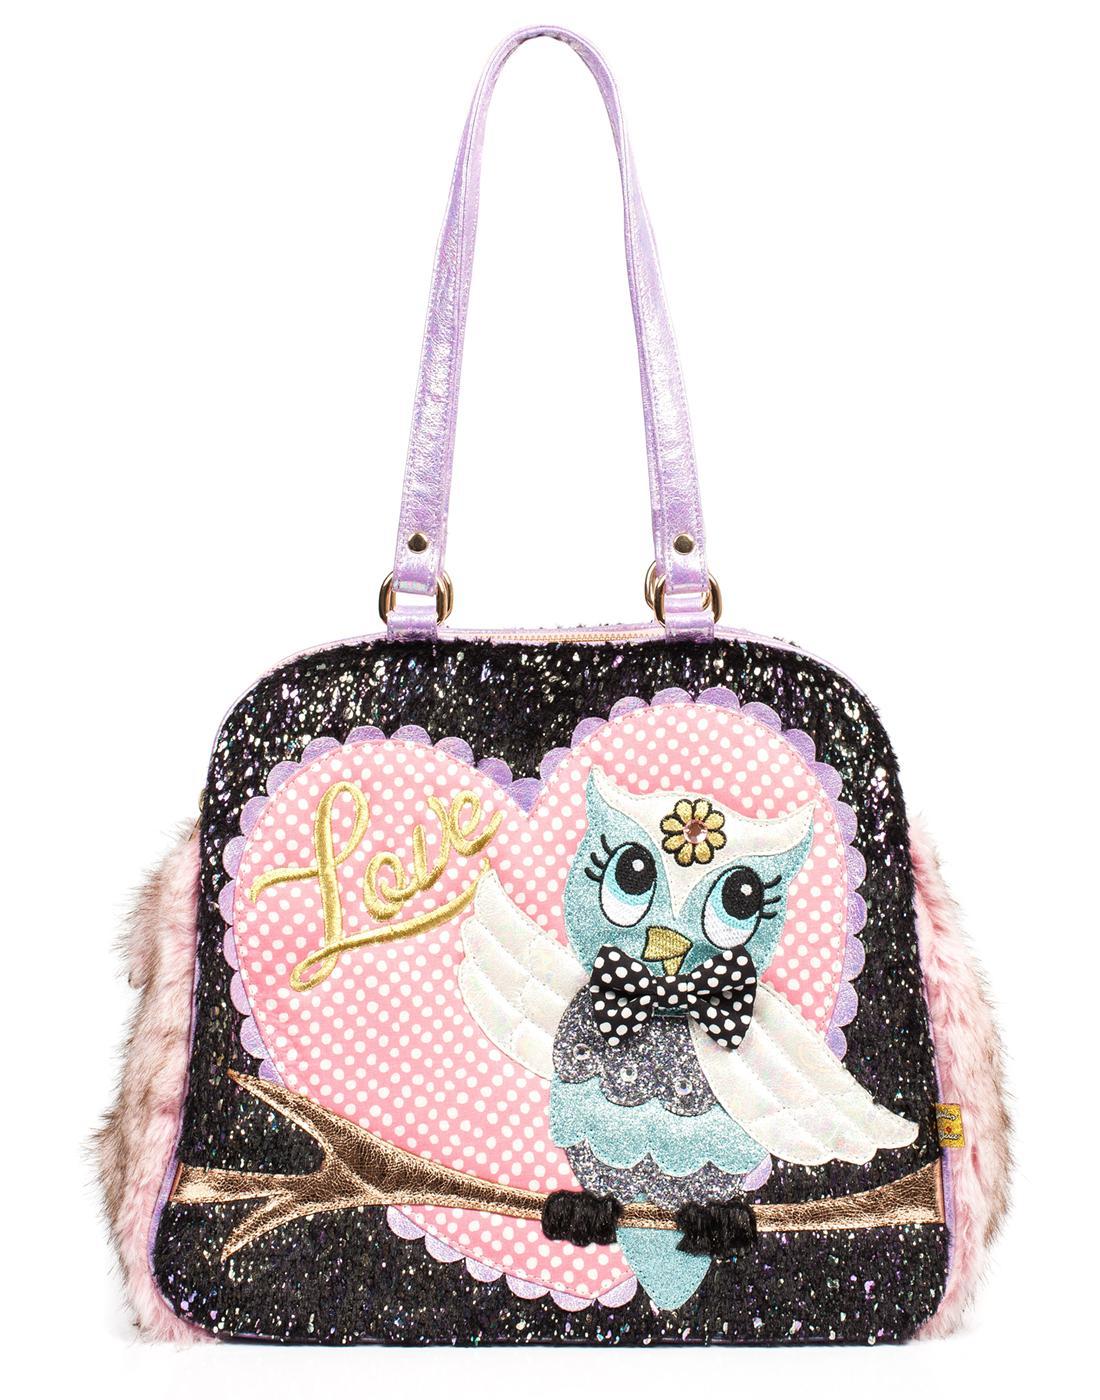 What A Hoot IRREGULAR CHOICE Owl Shoulder Bag P/B